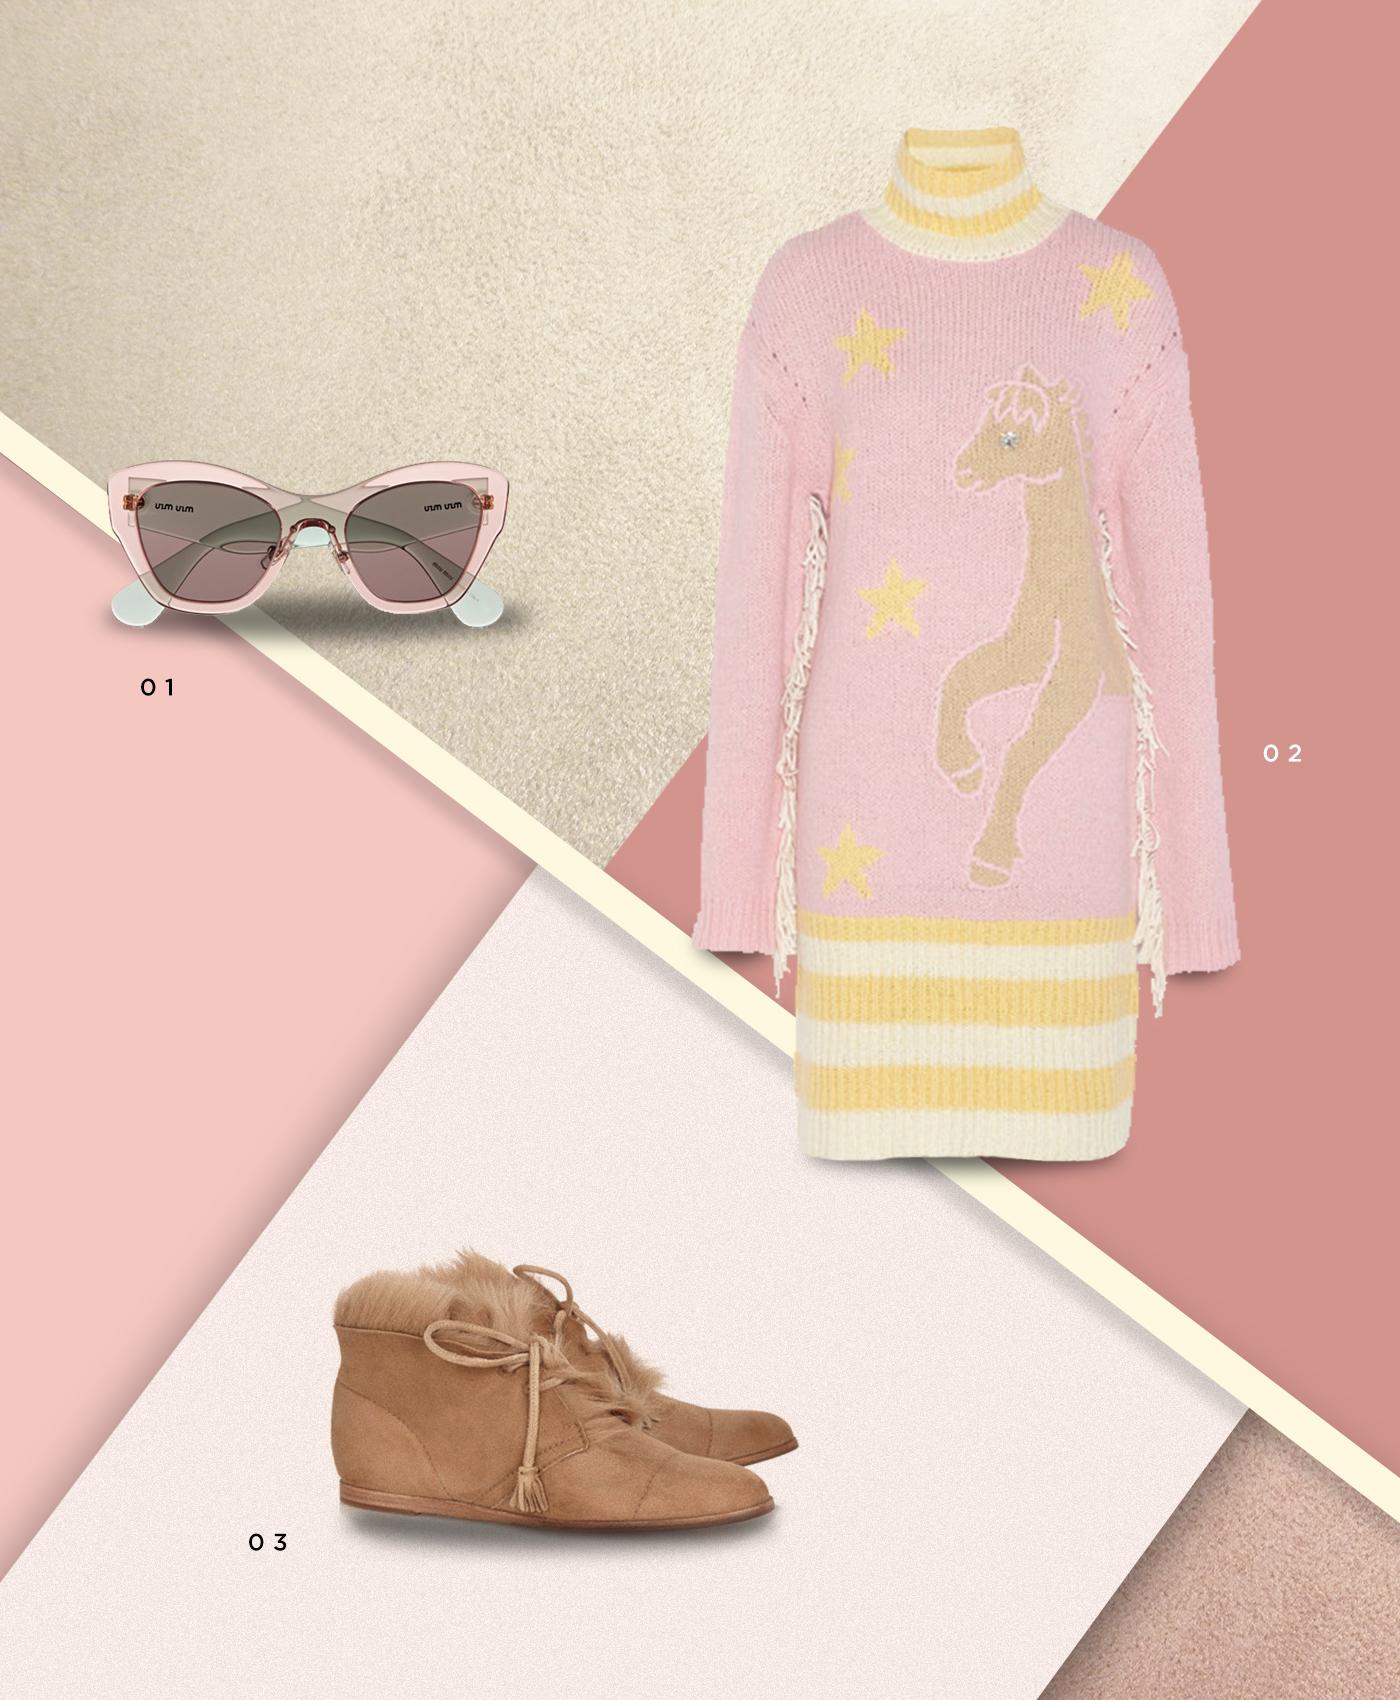 Maison-Mittweg-Looks-Miu-Miu-4-Ways-To-Wear-Pink